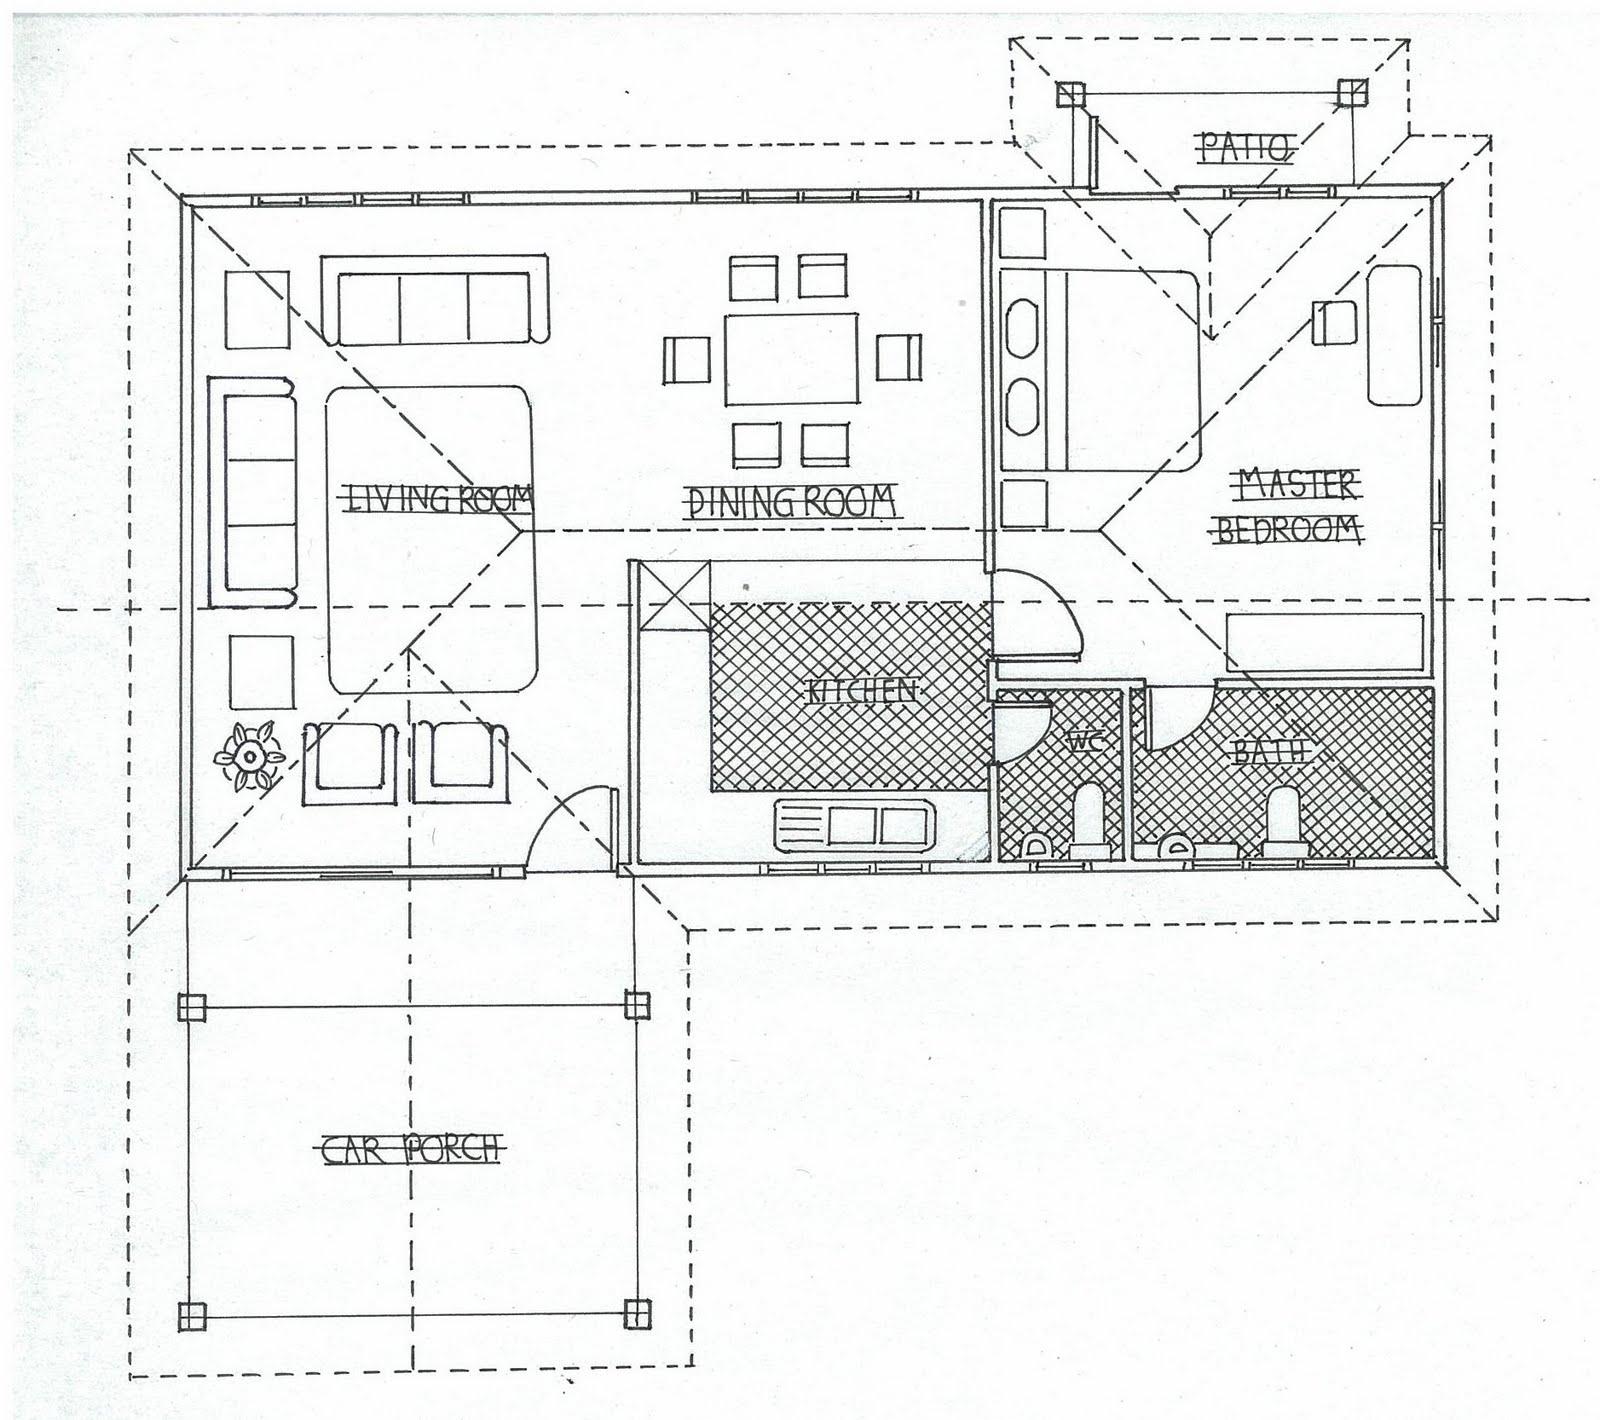 Elevation Plan Measurements : Design visualization sj site plan and elevation